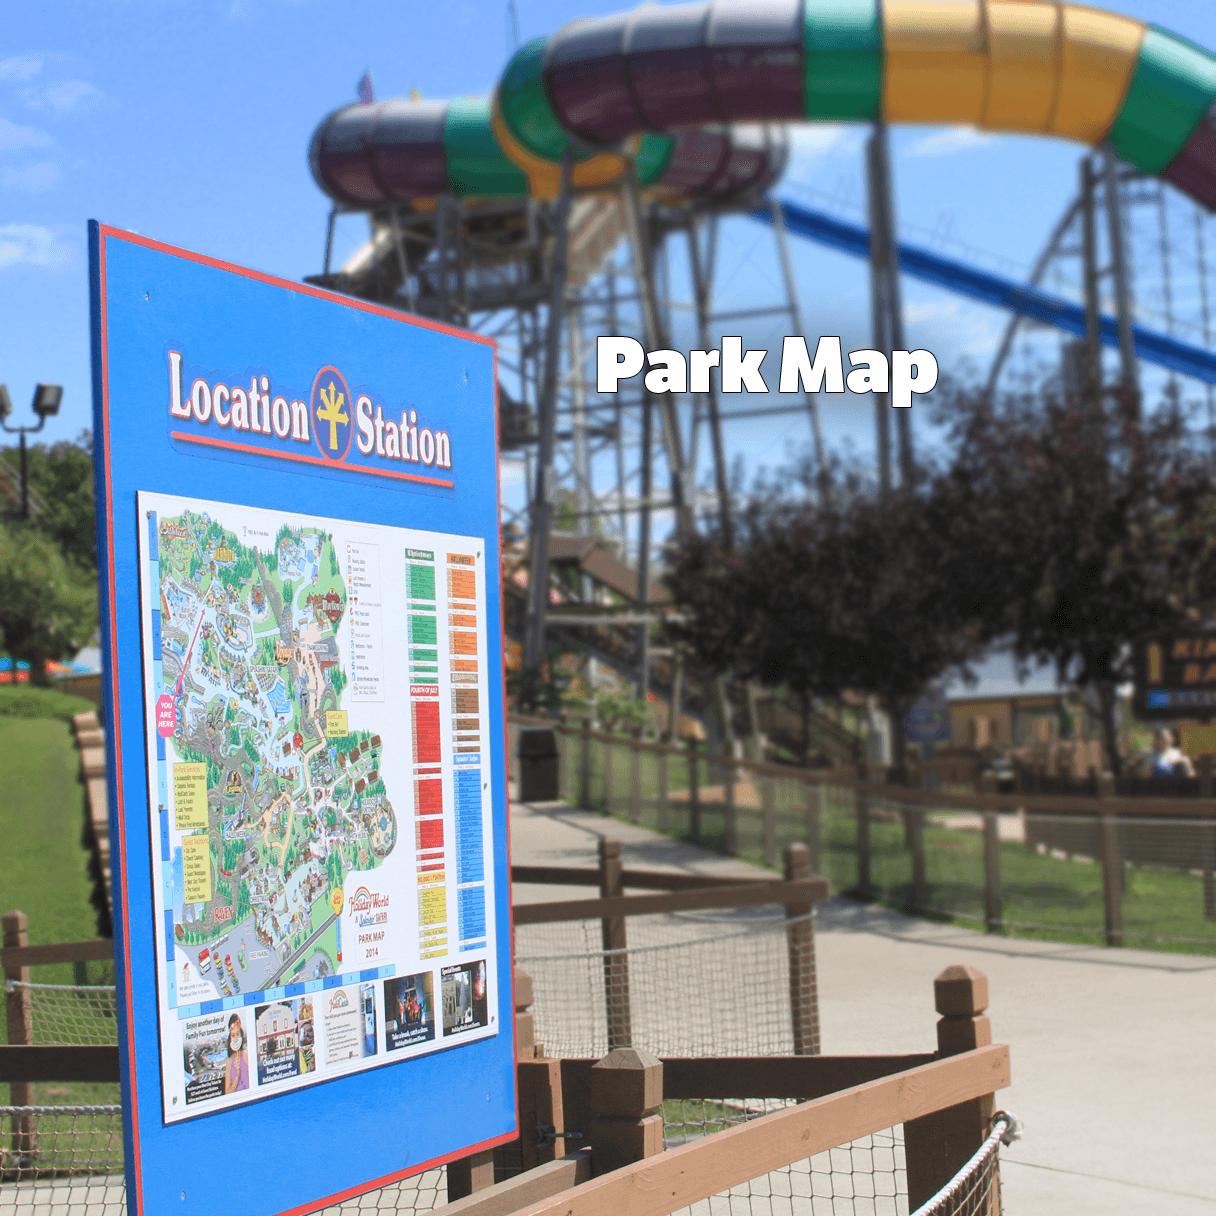 Holiday World & Splashin' Safari Park Map | Holiday World & Splashin' Safari